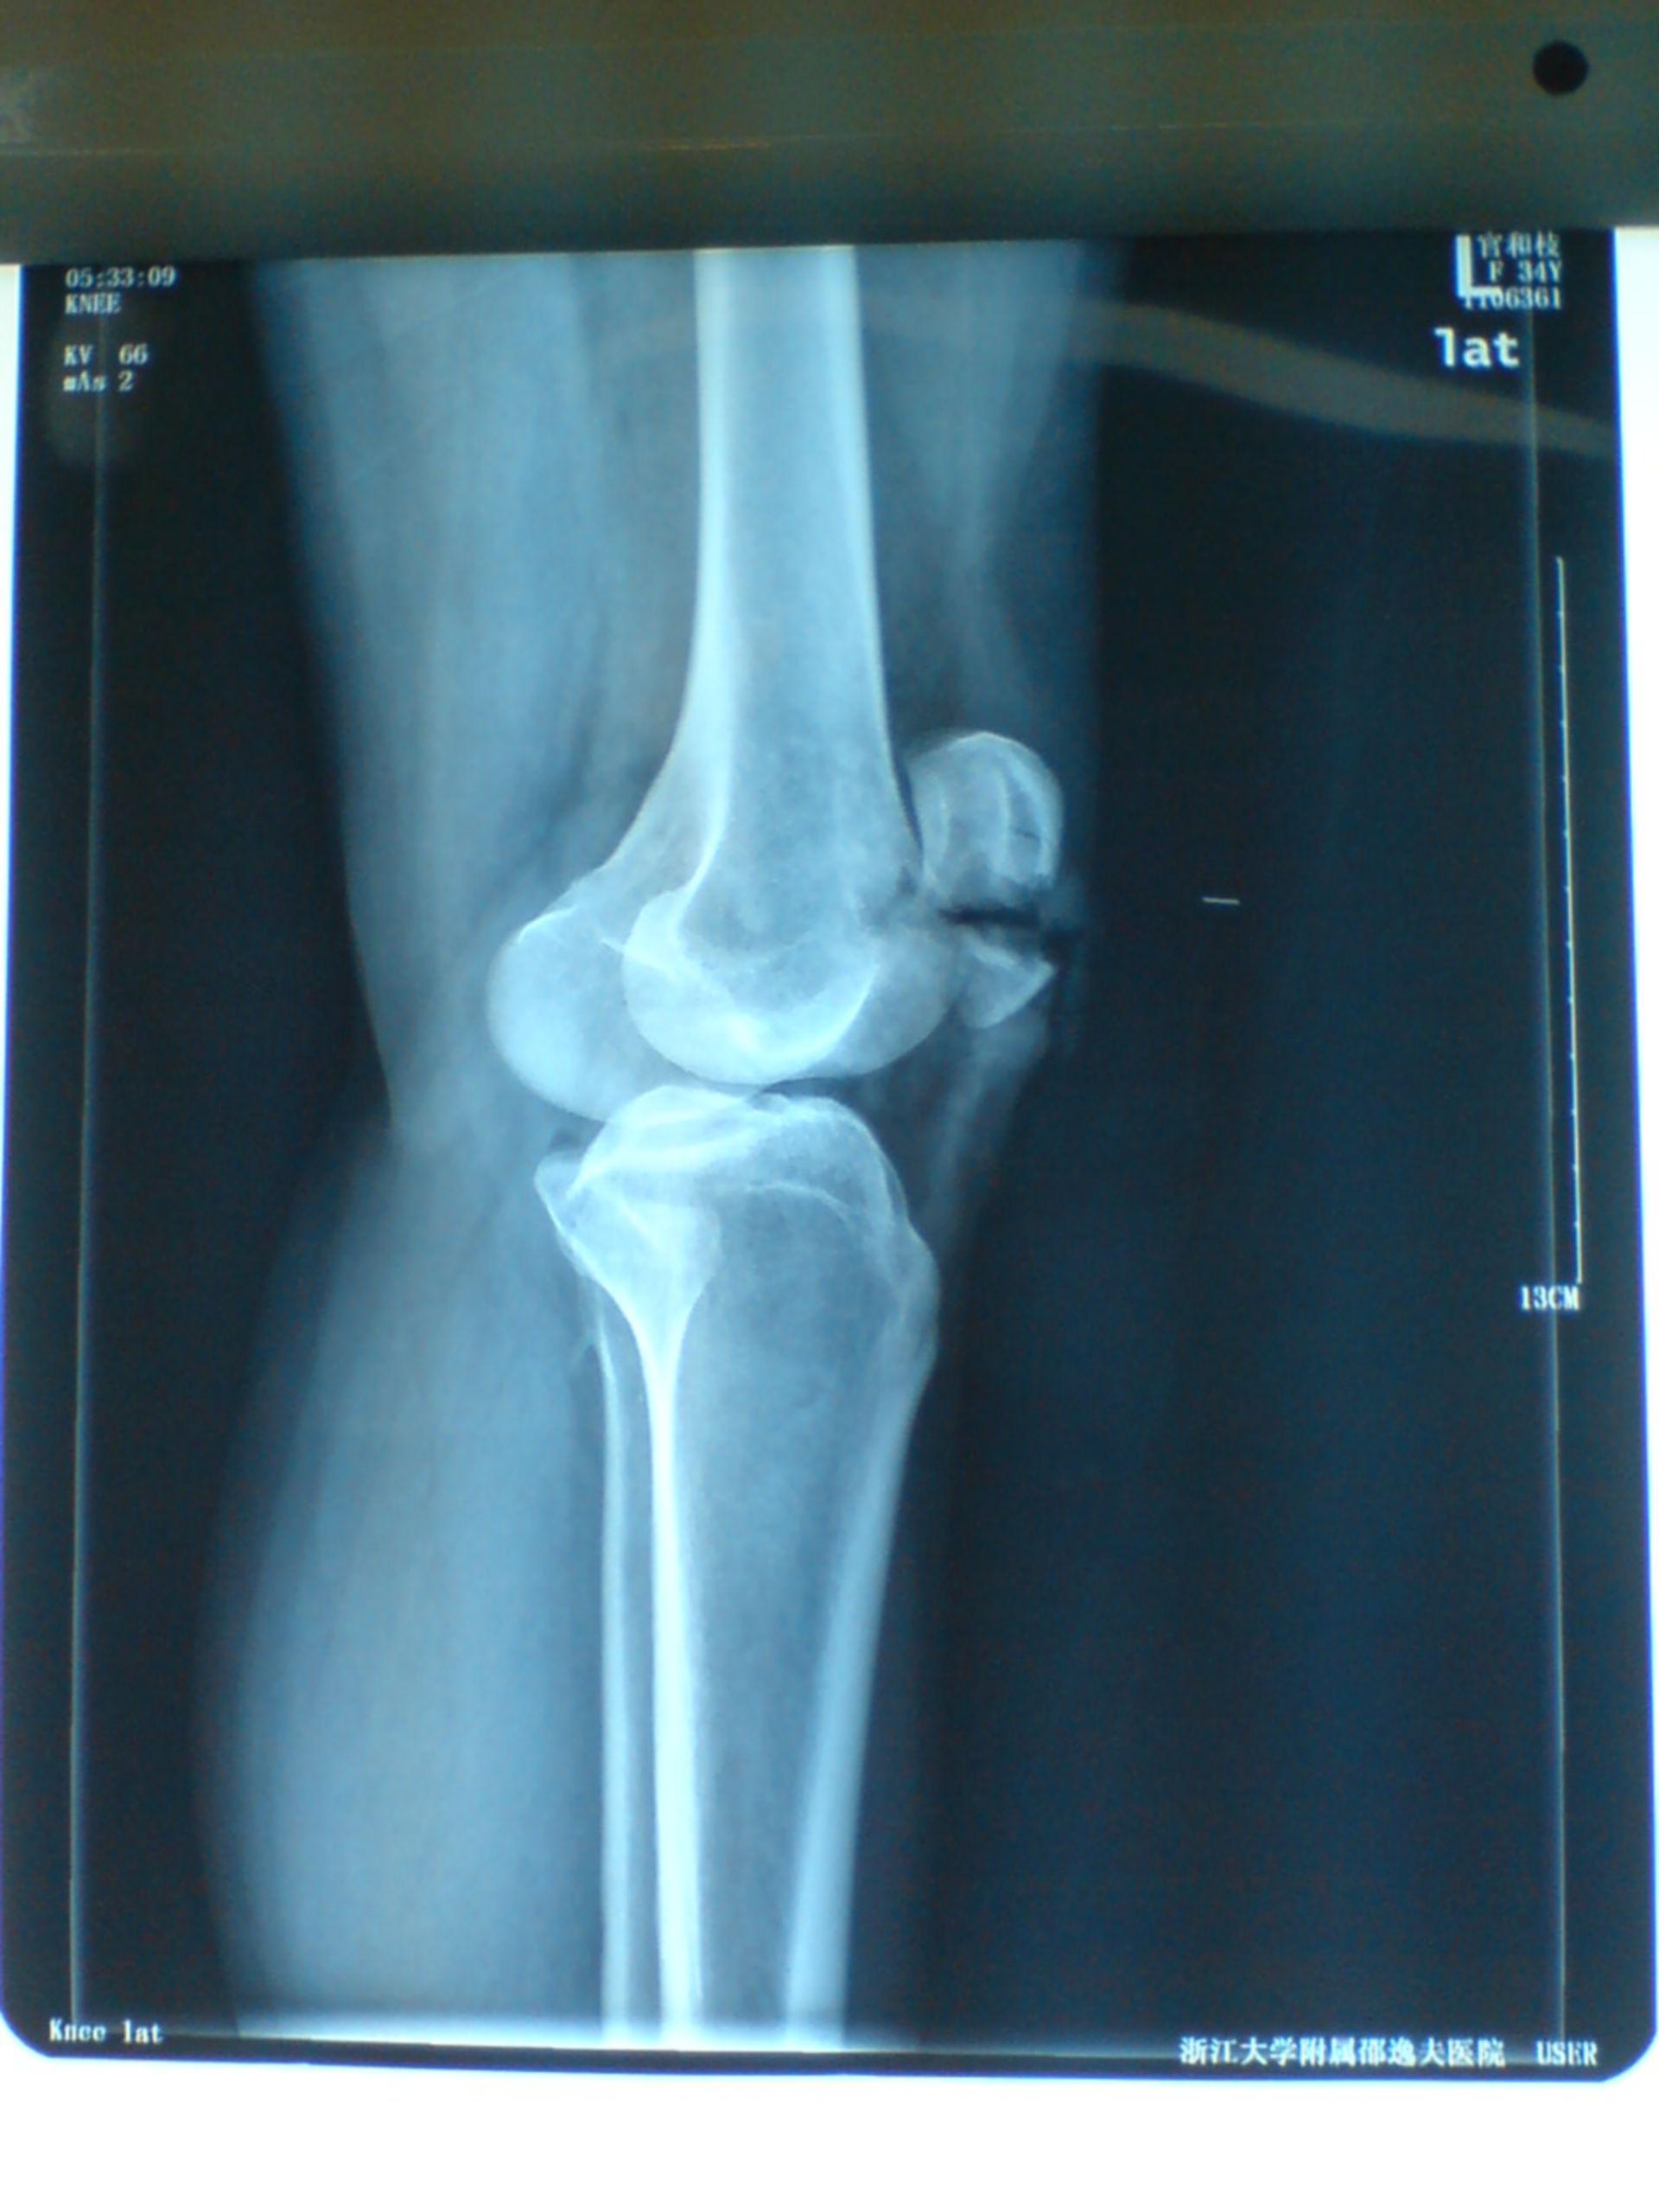 Transverse patella fracture